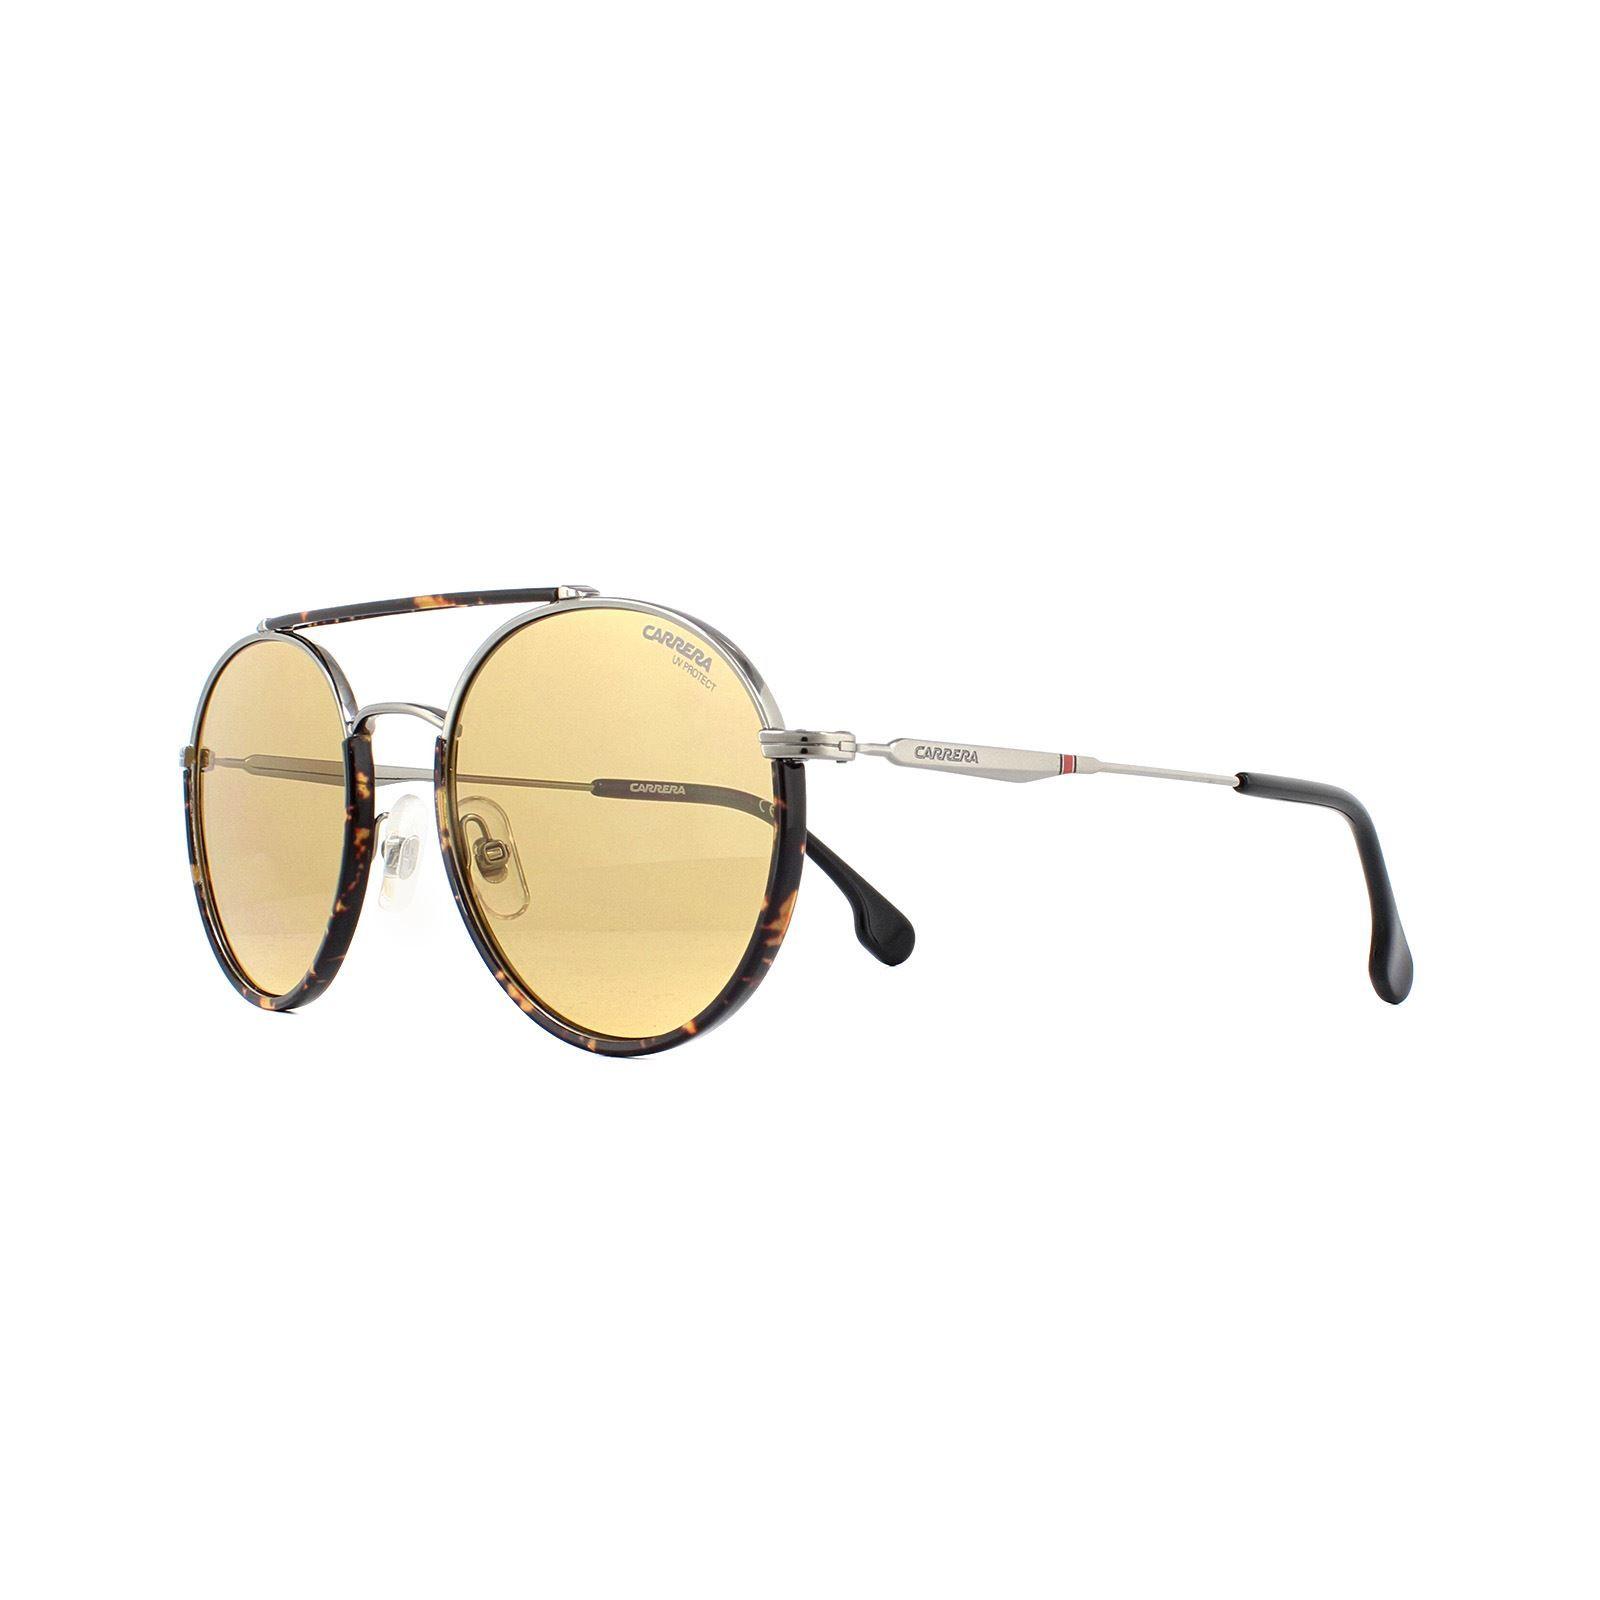 Carrera Sunglasses 208/S 6LB 70 Ruthenium Brown